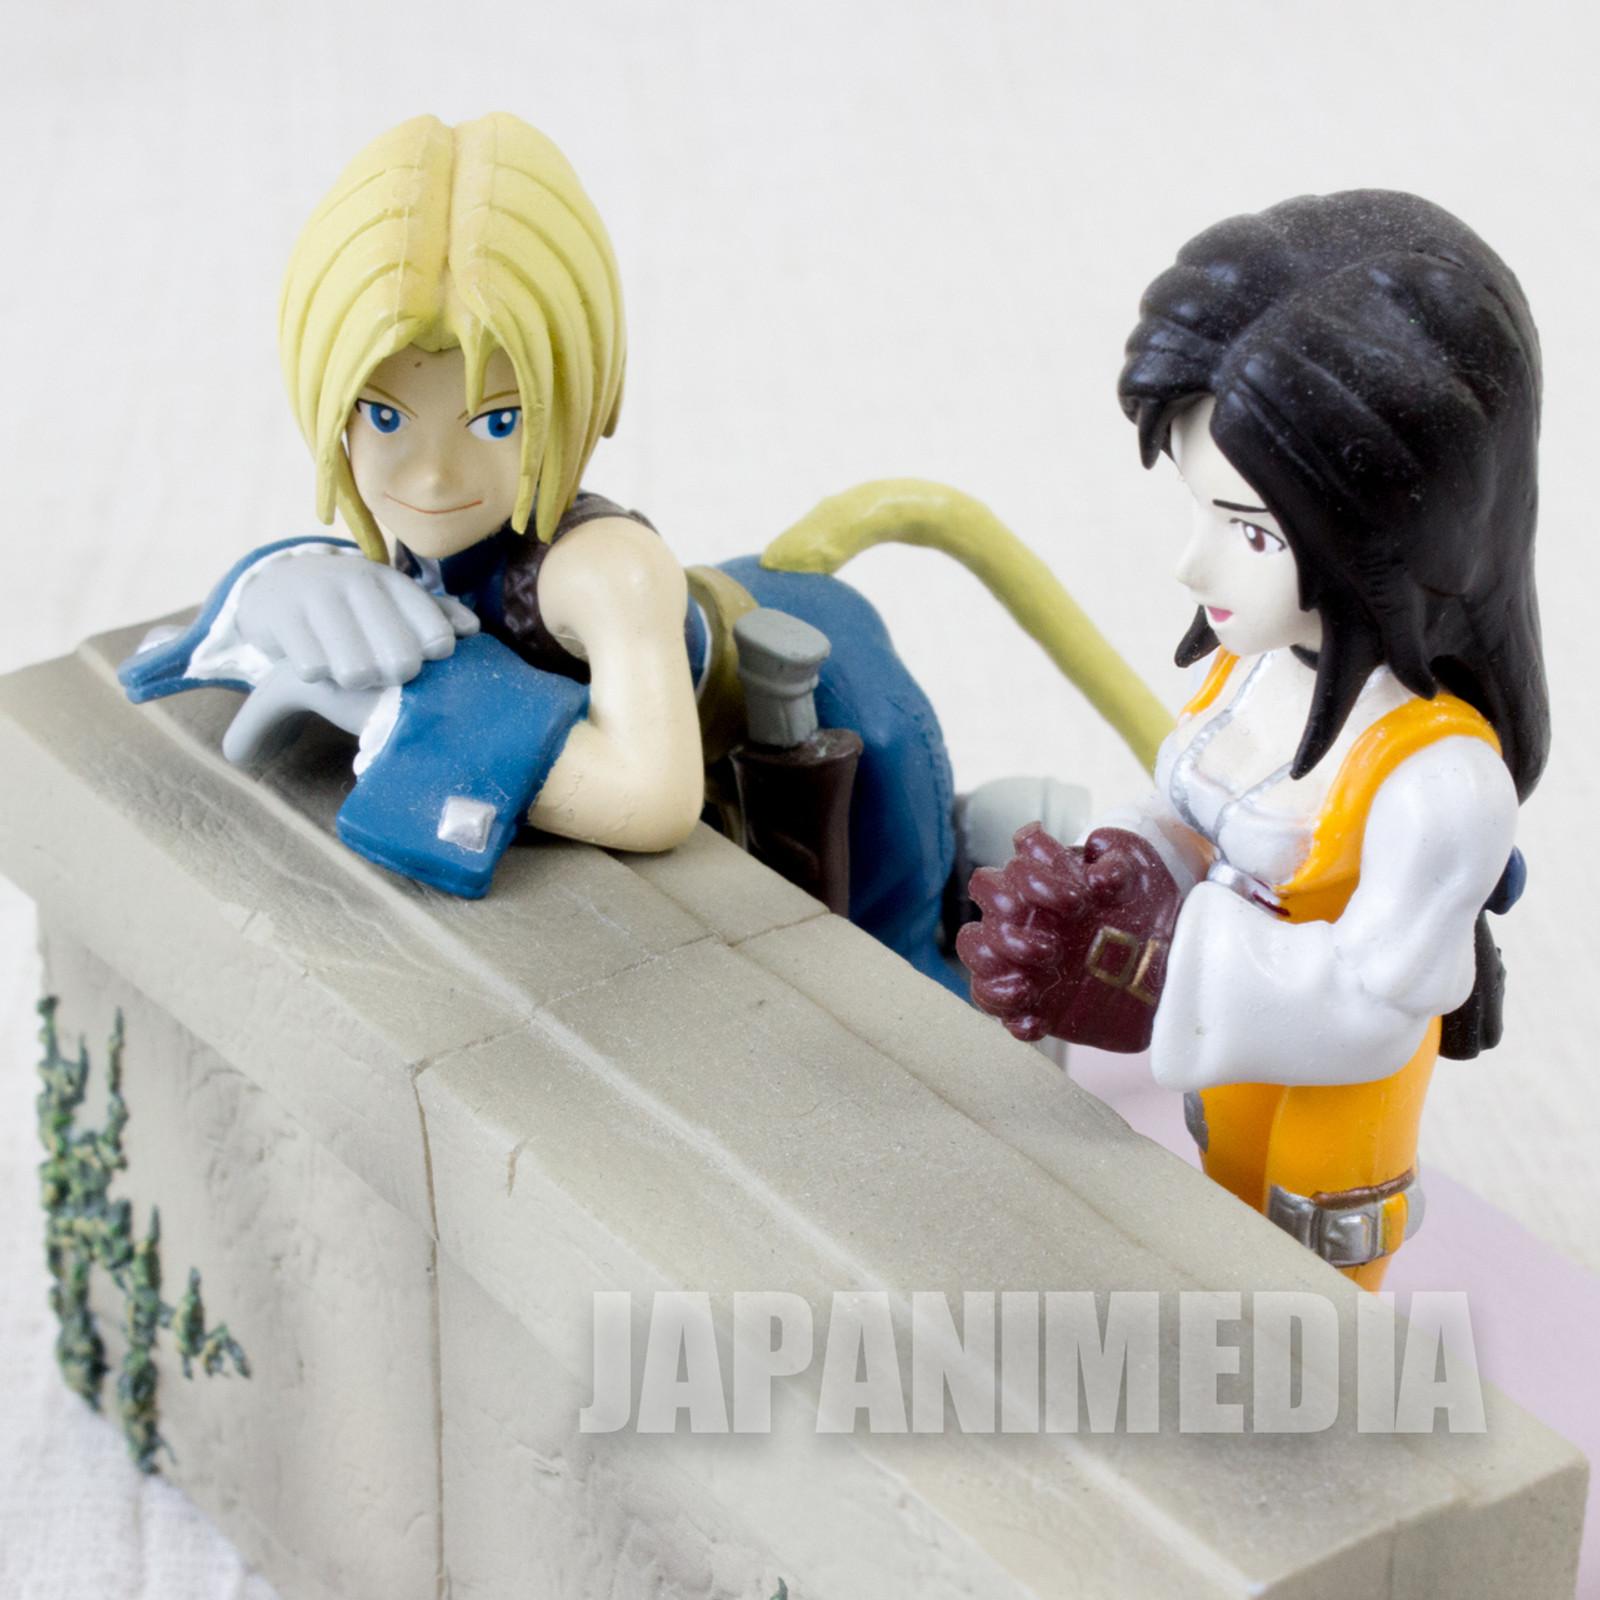 Final Fantasy IX 9 Zidane Garnet Diorama Figure Banpresto SQUARE ENIX GAME [No Box]